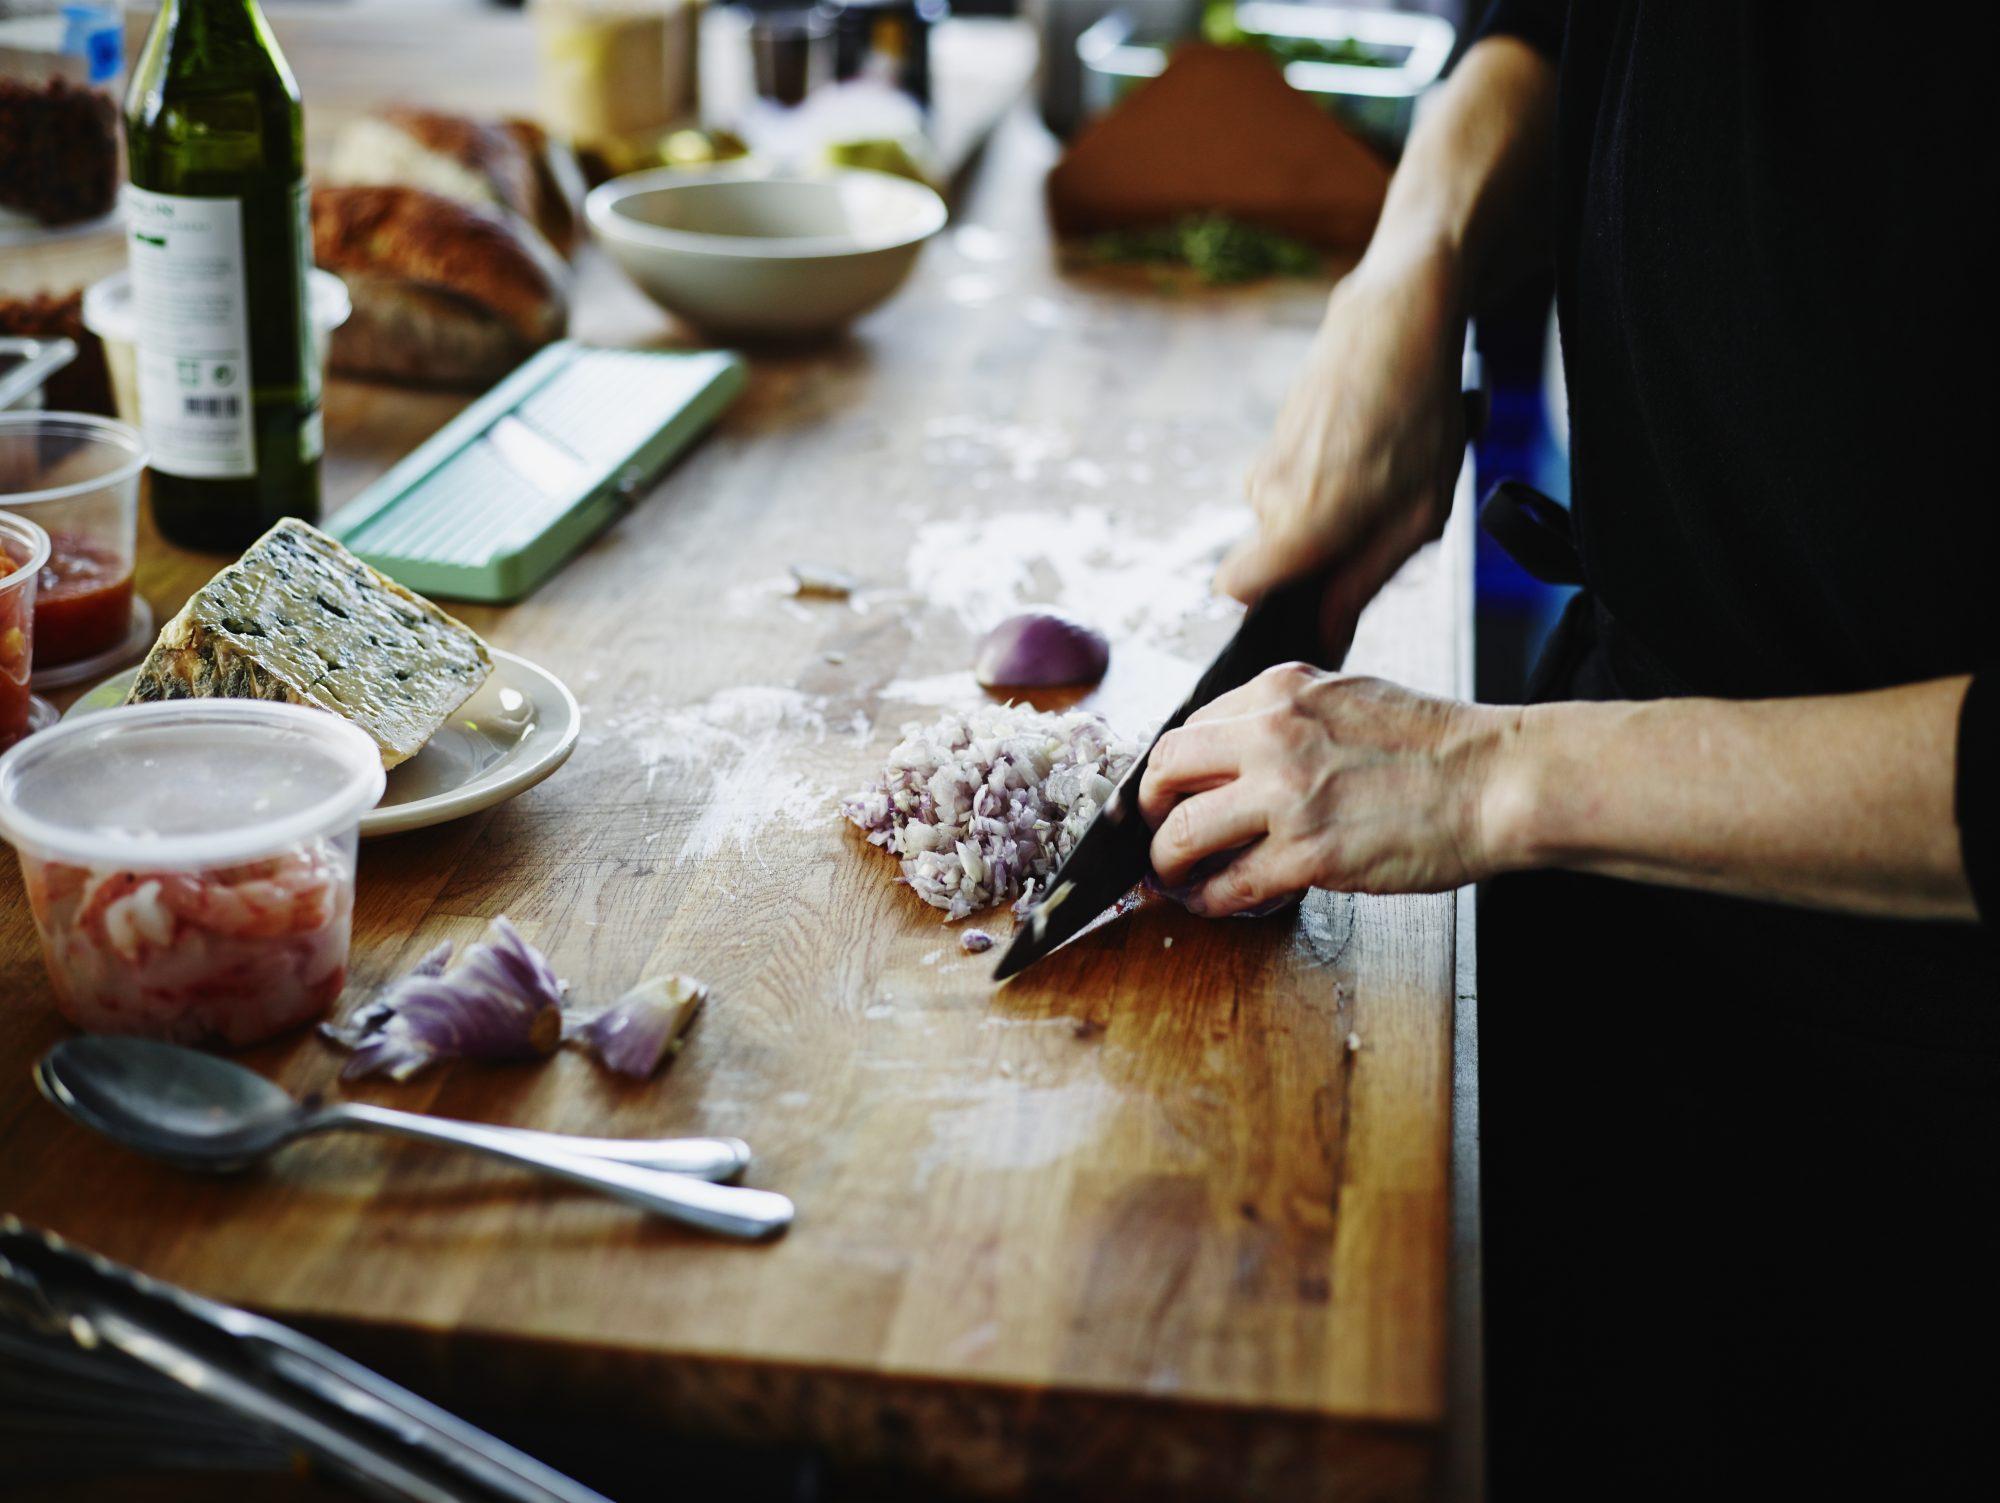 Chopping onion on butcher block countertop